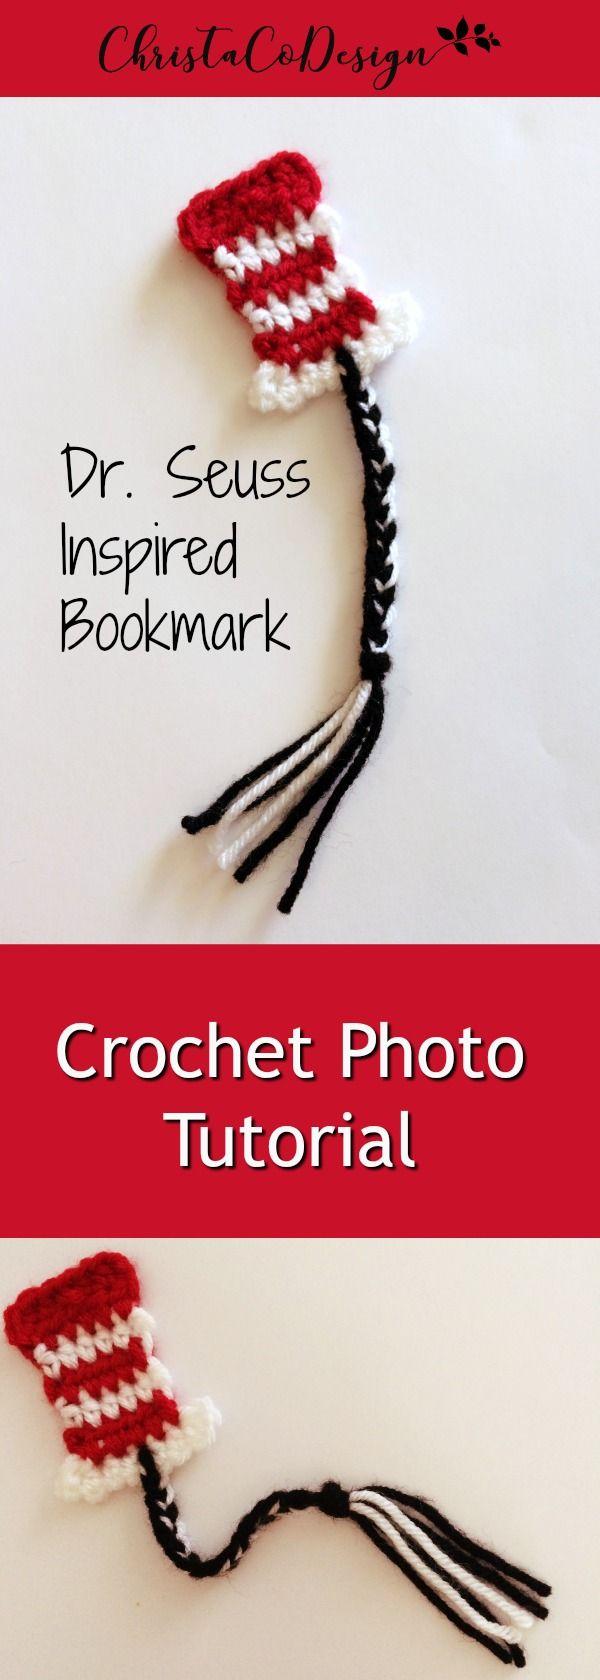 Dr. Seuss inspired bookmark | crochet bookmark | photo tutorial | crochet tutorial | easy crochet pattern | beginner crochet tutorial | cat in the hat | bookmarks | diy bookmark